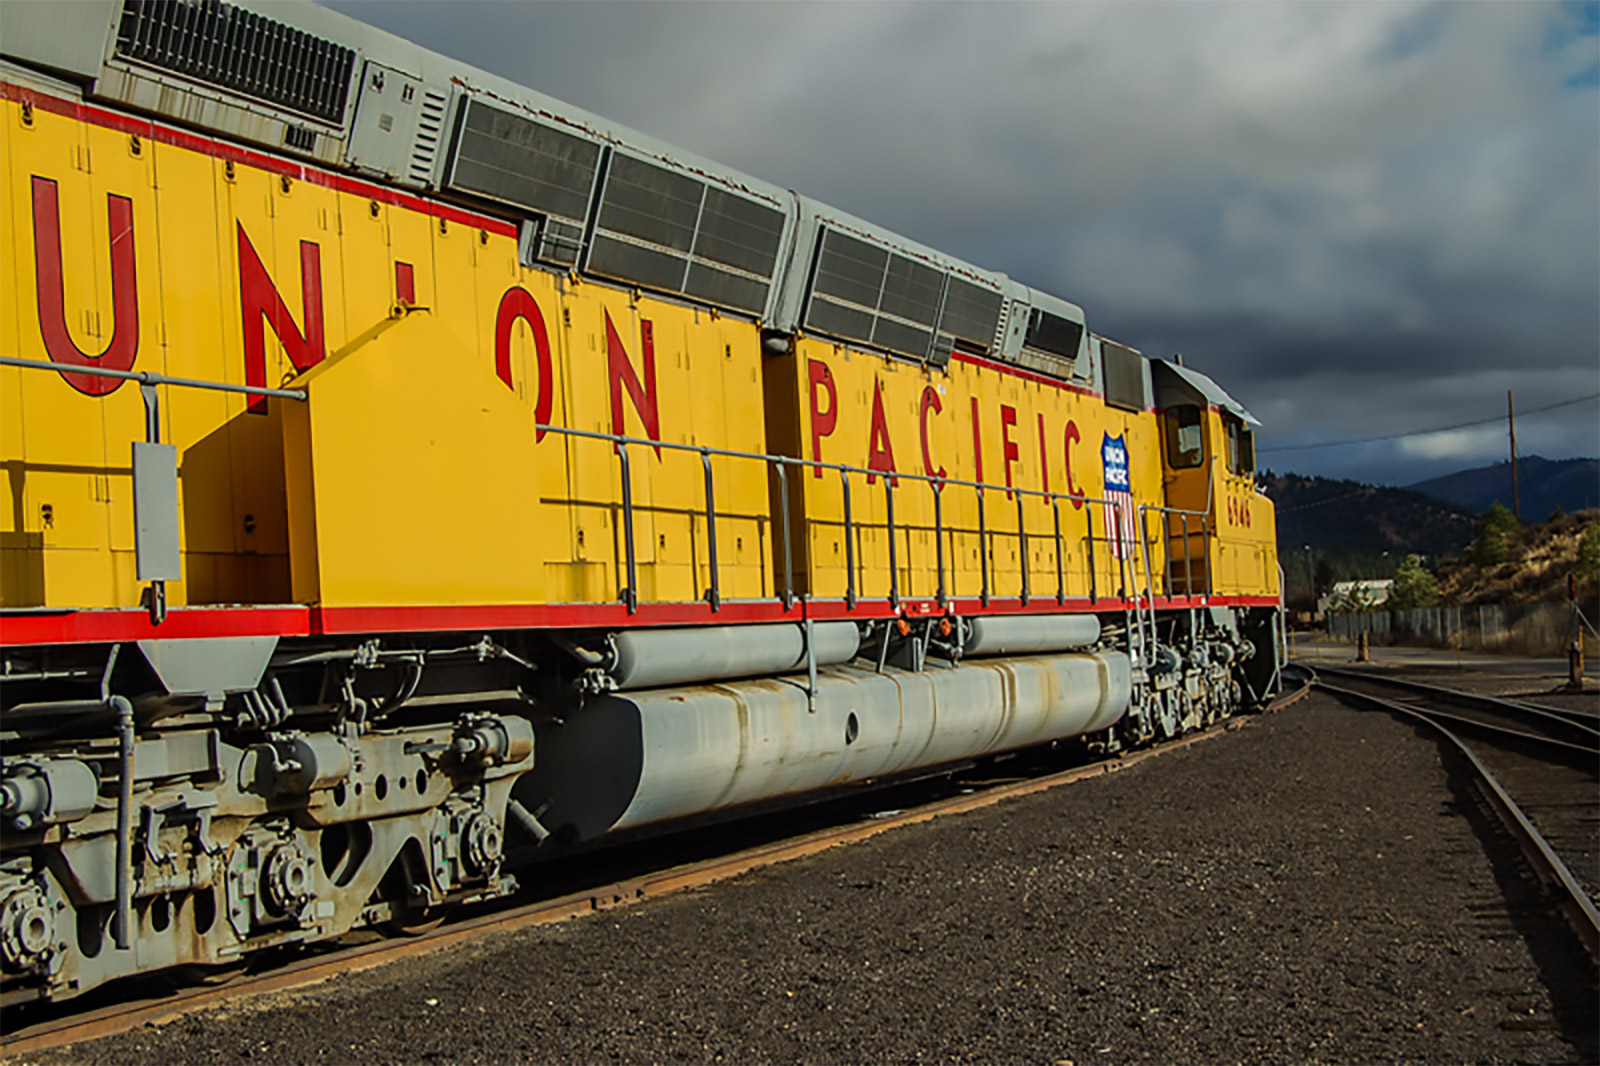 Portola Railroad Museum